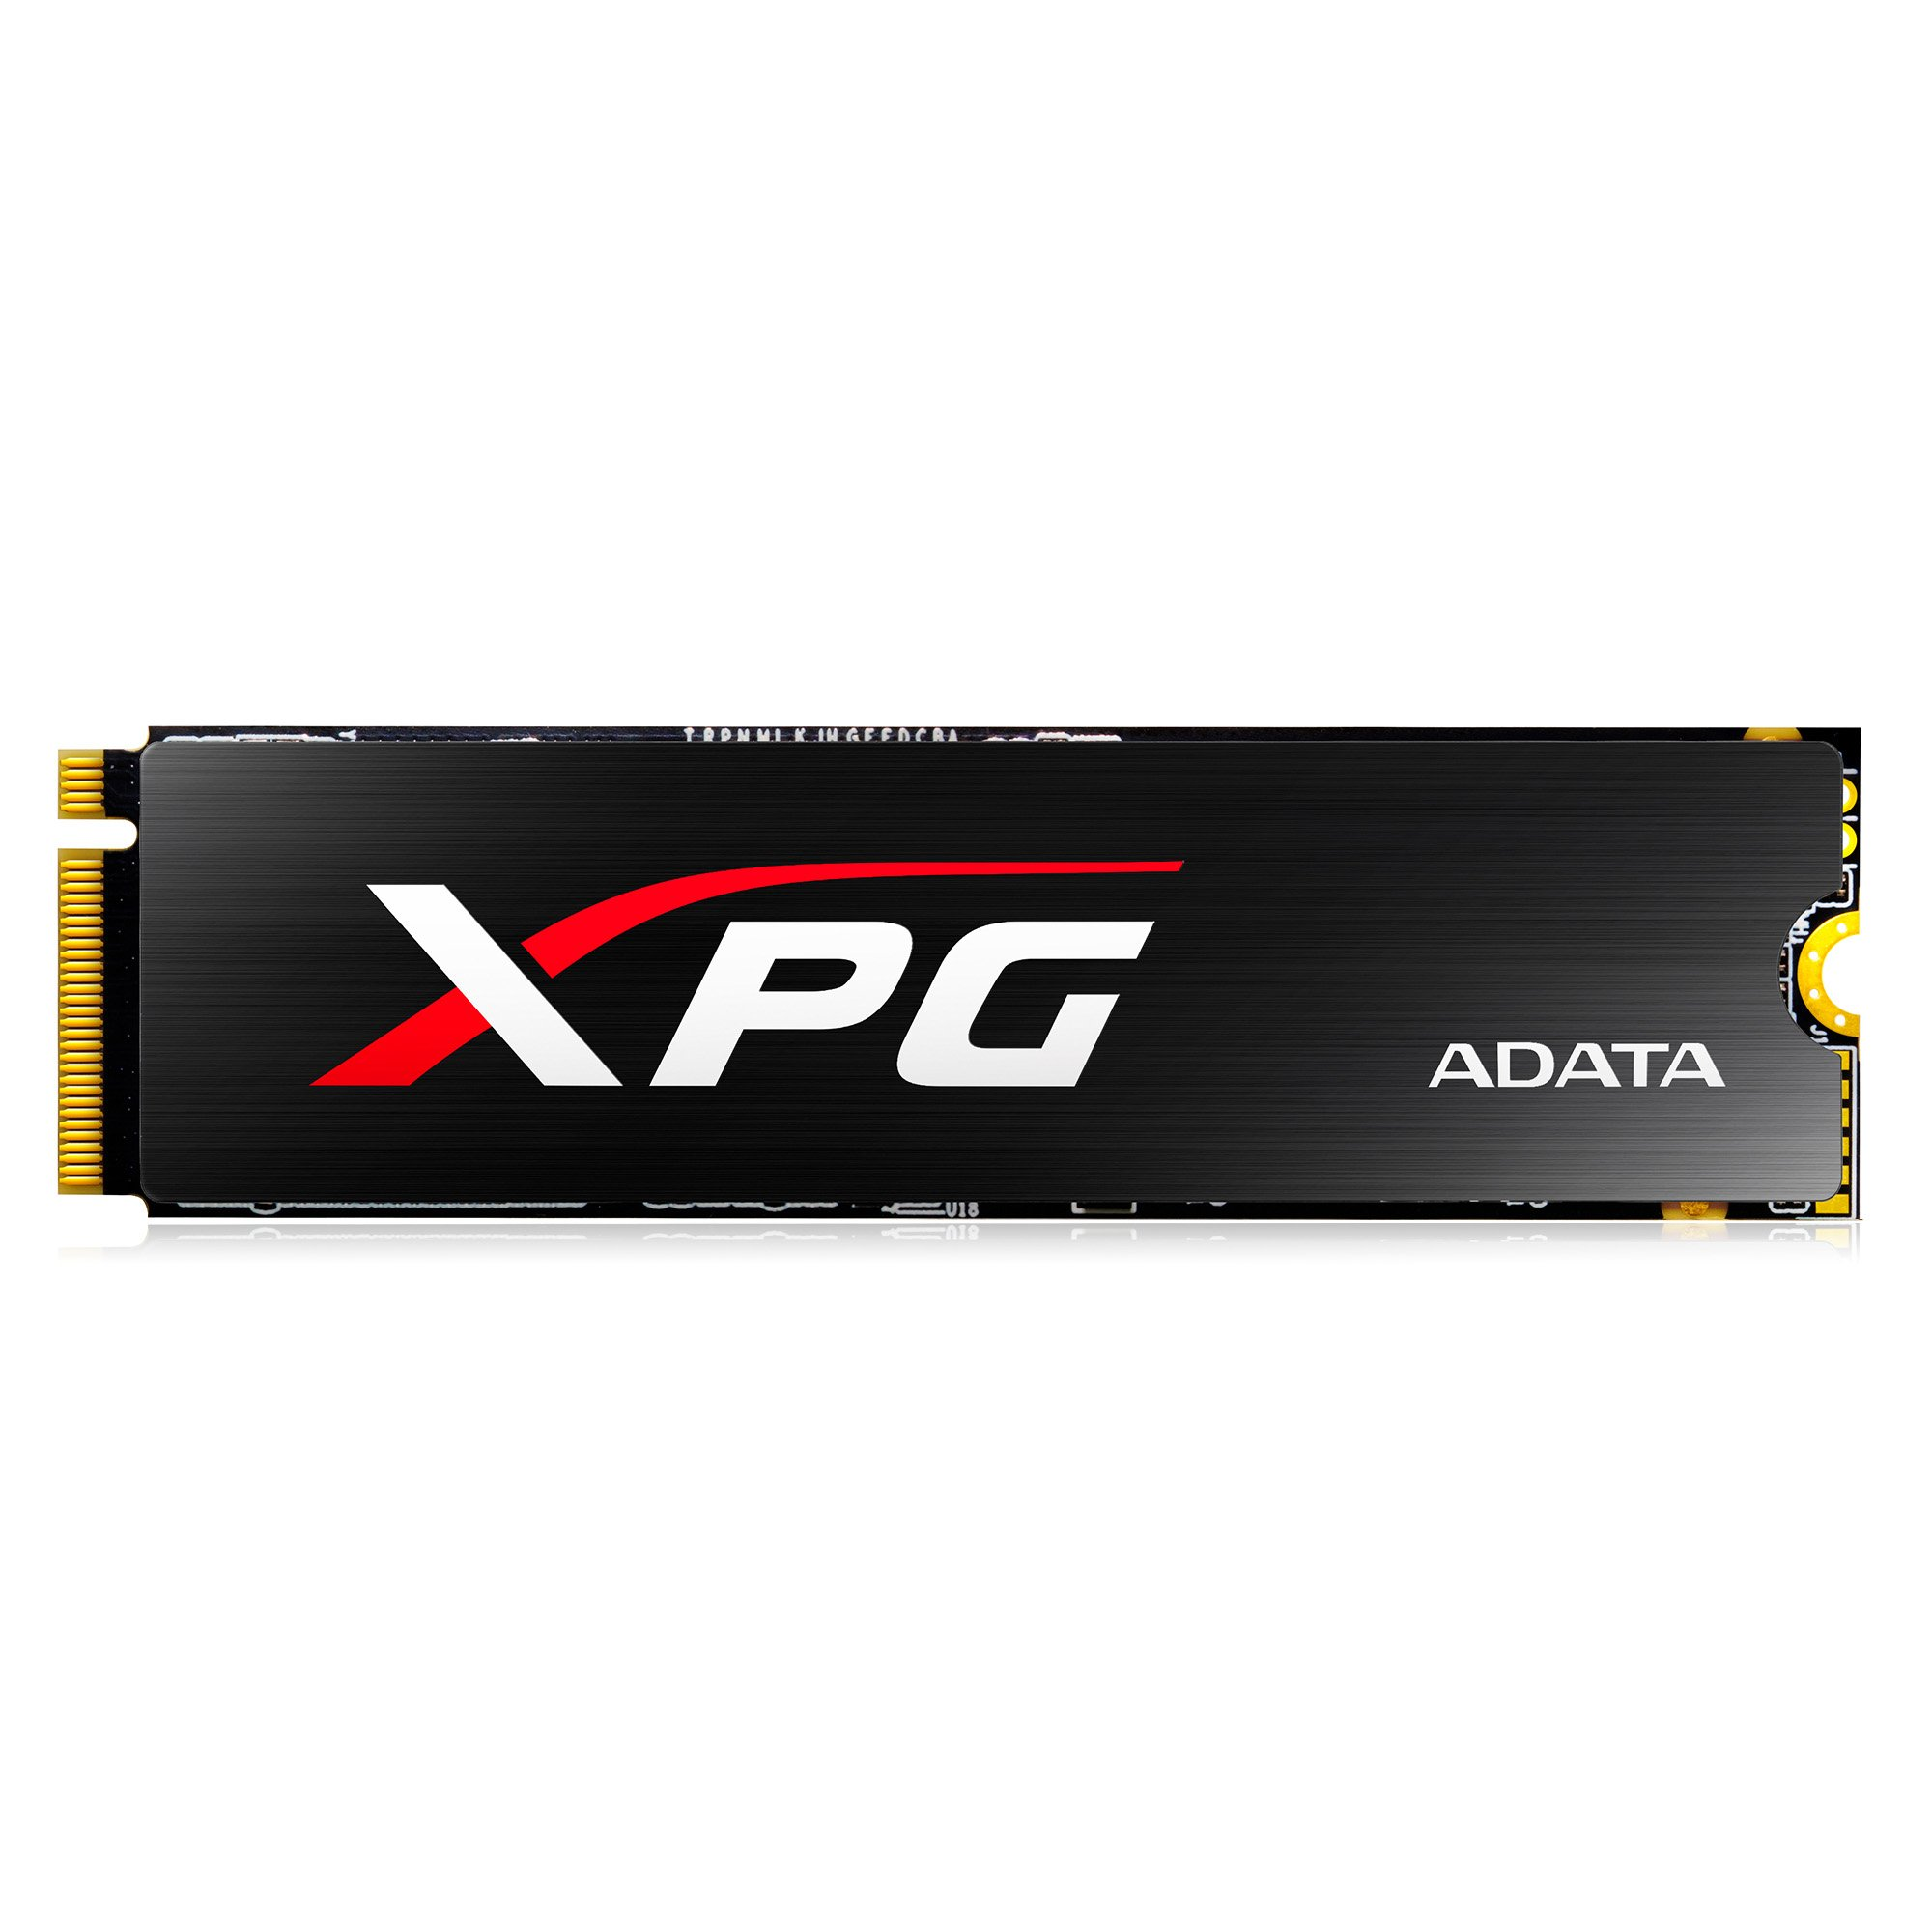 XPG SX8000 PCIe 128GB 3D NAND MLC NVMe Gen3x4 M.2 2280 Solid State Drive with Heatsink (ASX8000NPC-128GM-C)